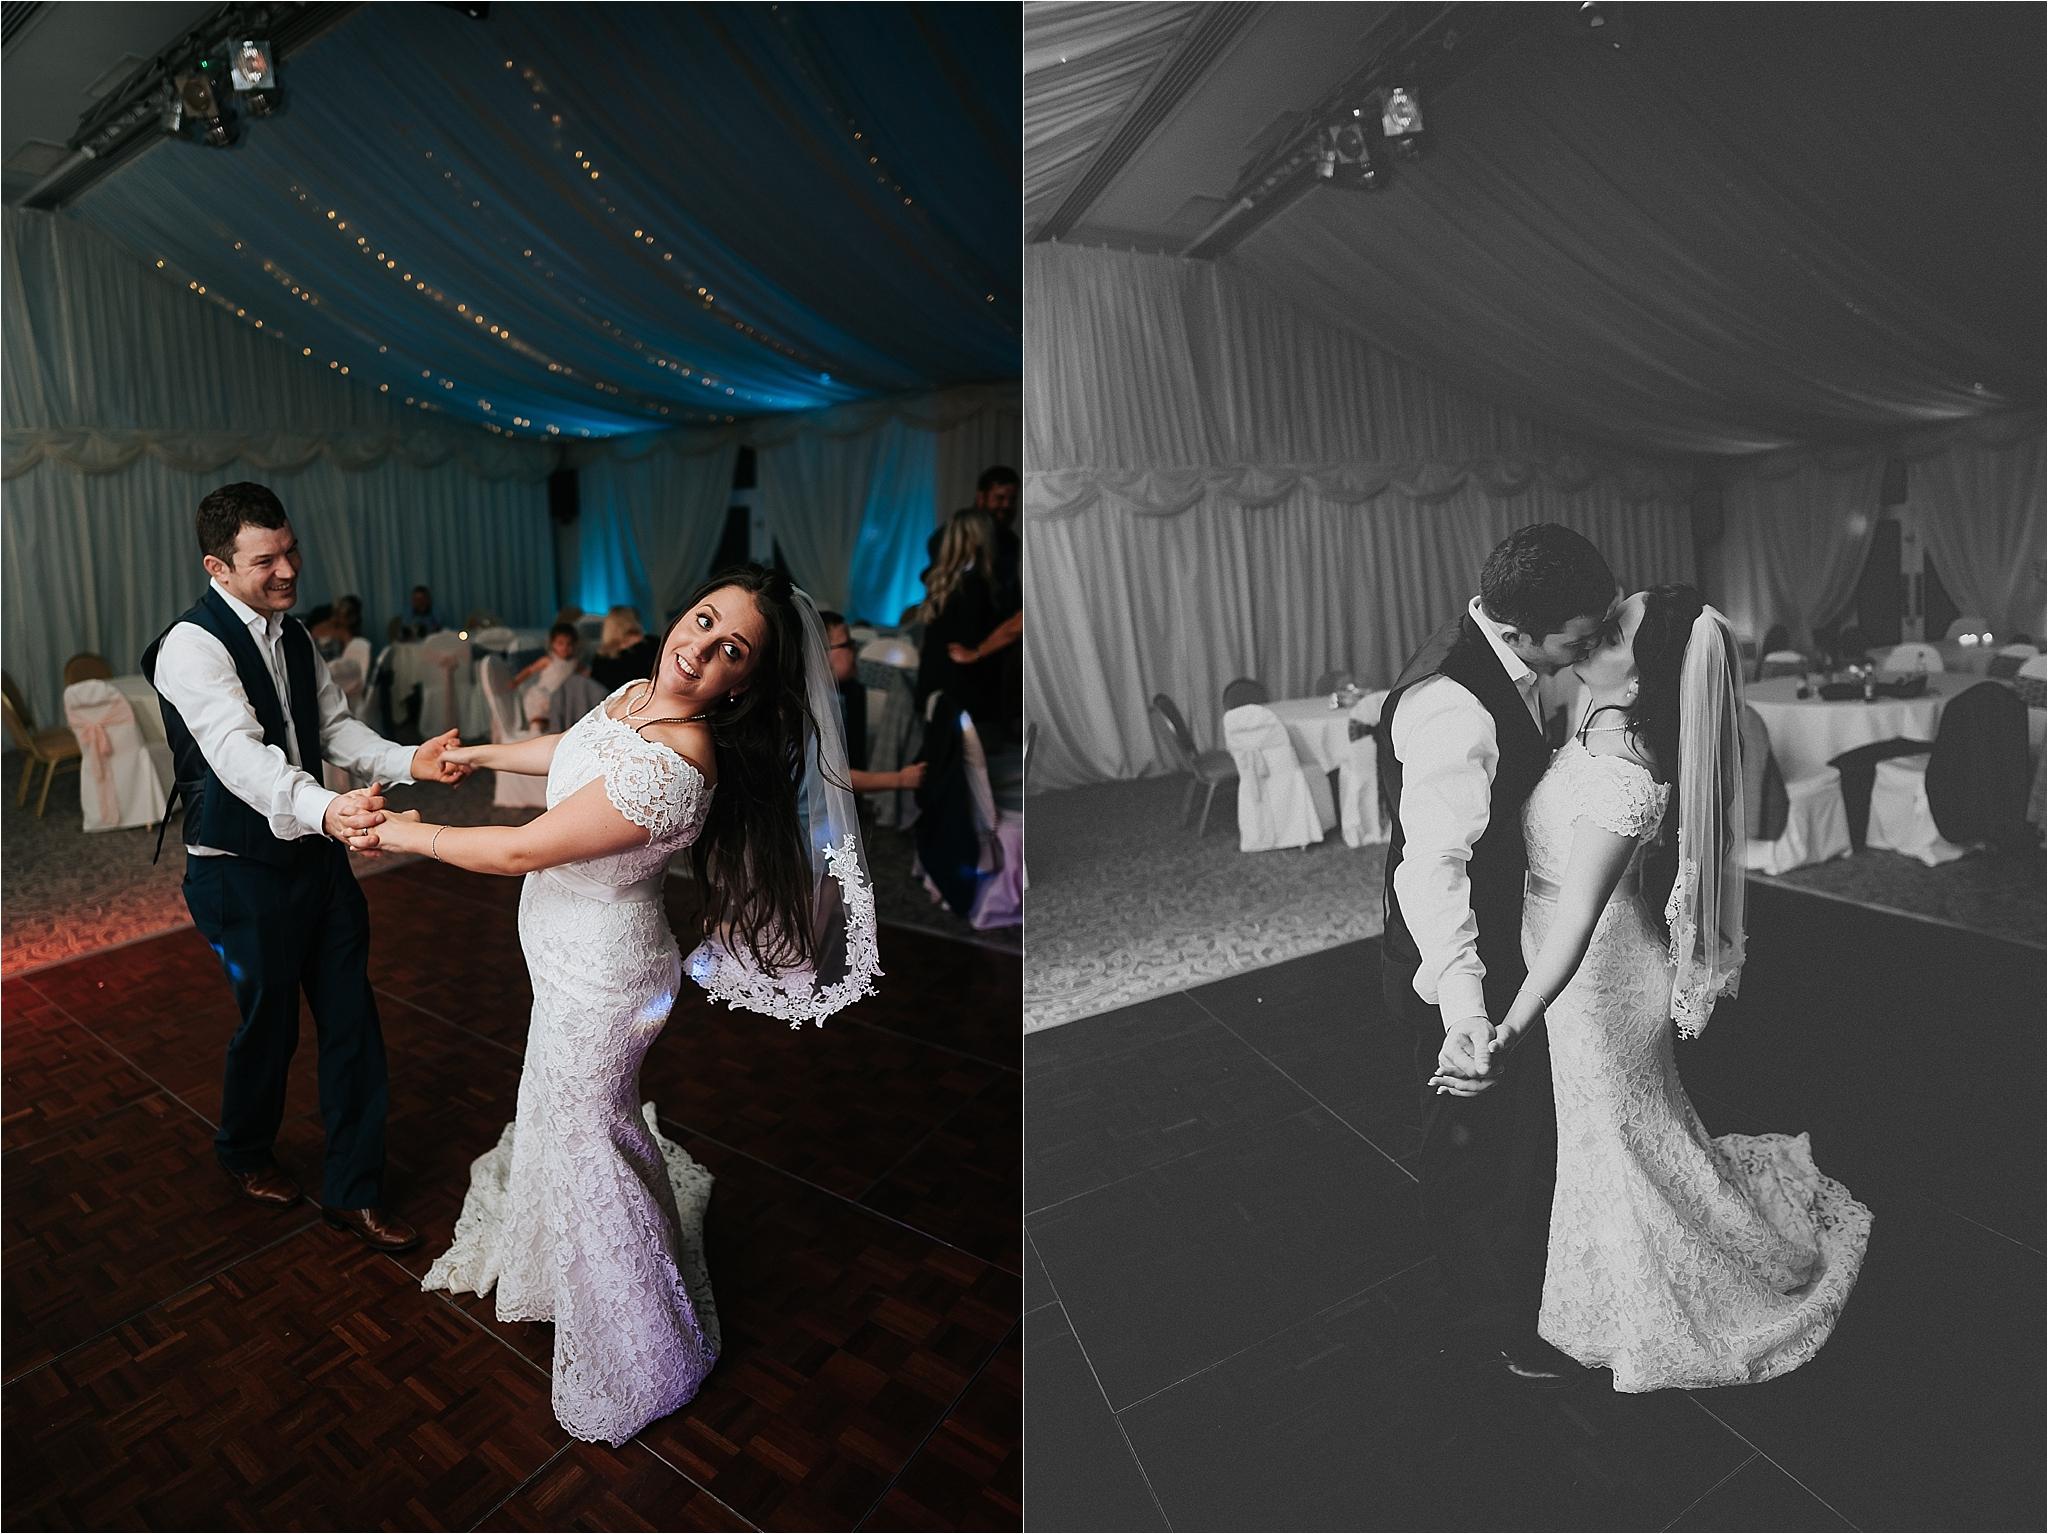 thevilla+lancashire+wreagreen+wedding+photographer122.jpg